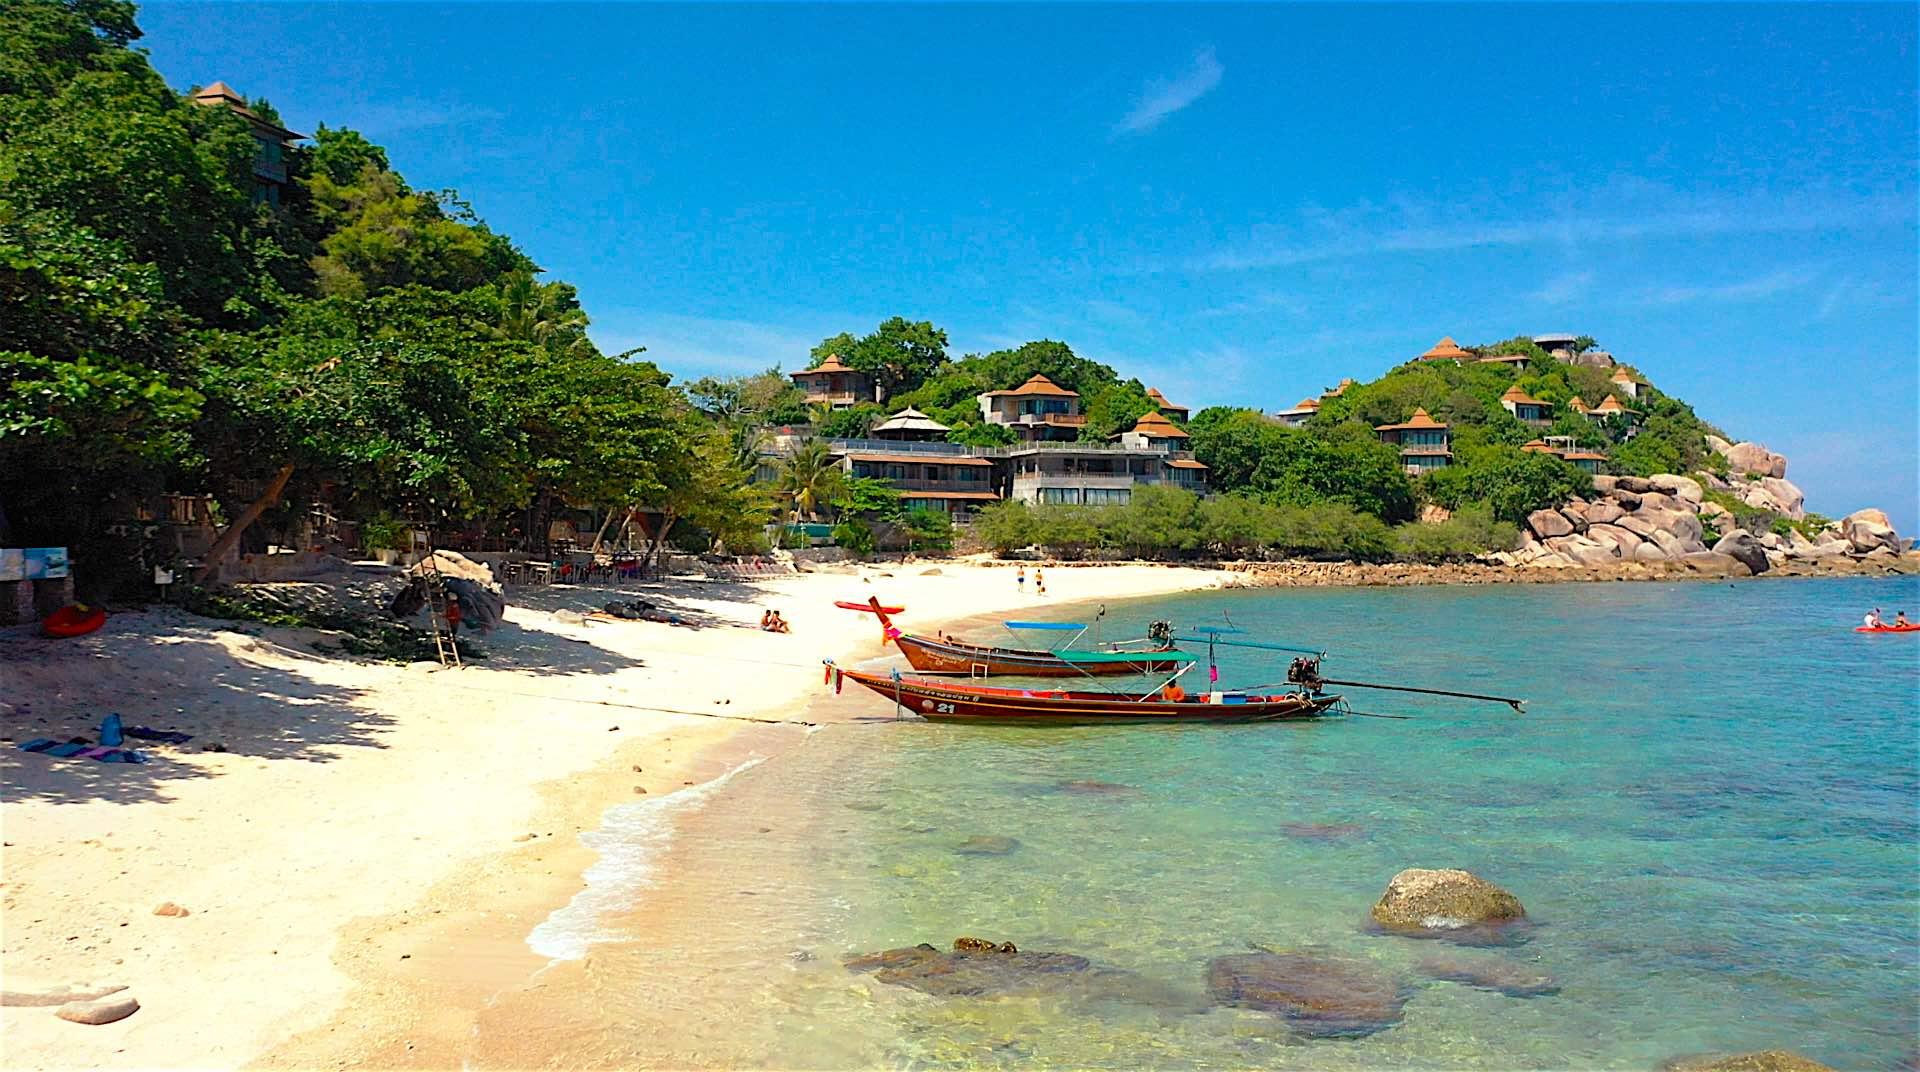 www.thefunkyturtle.com saideng beach on koh tao island